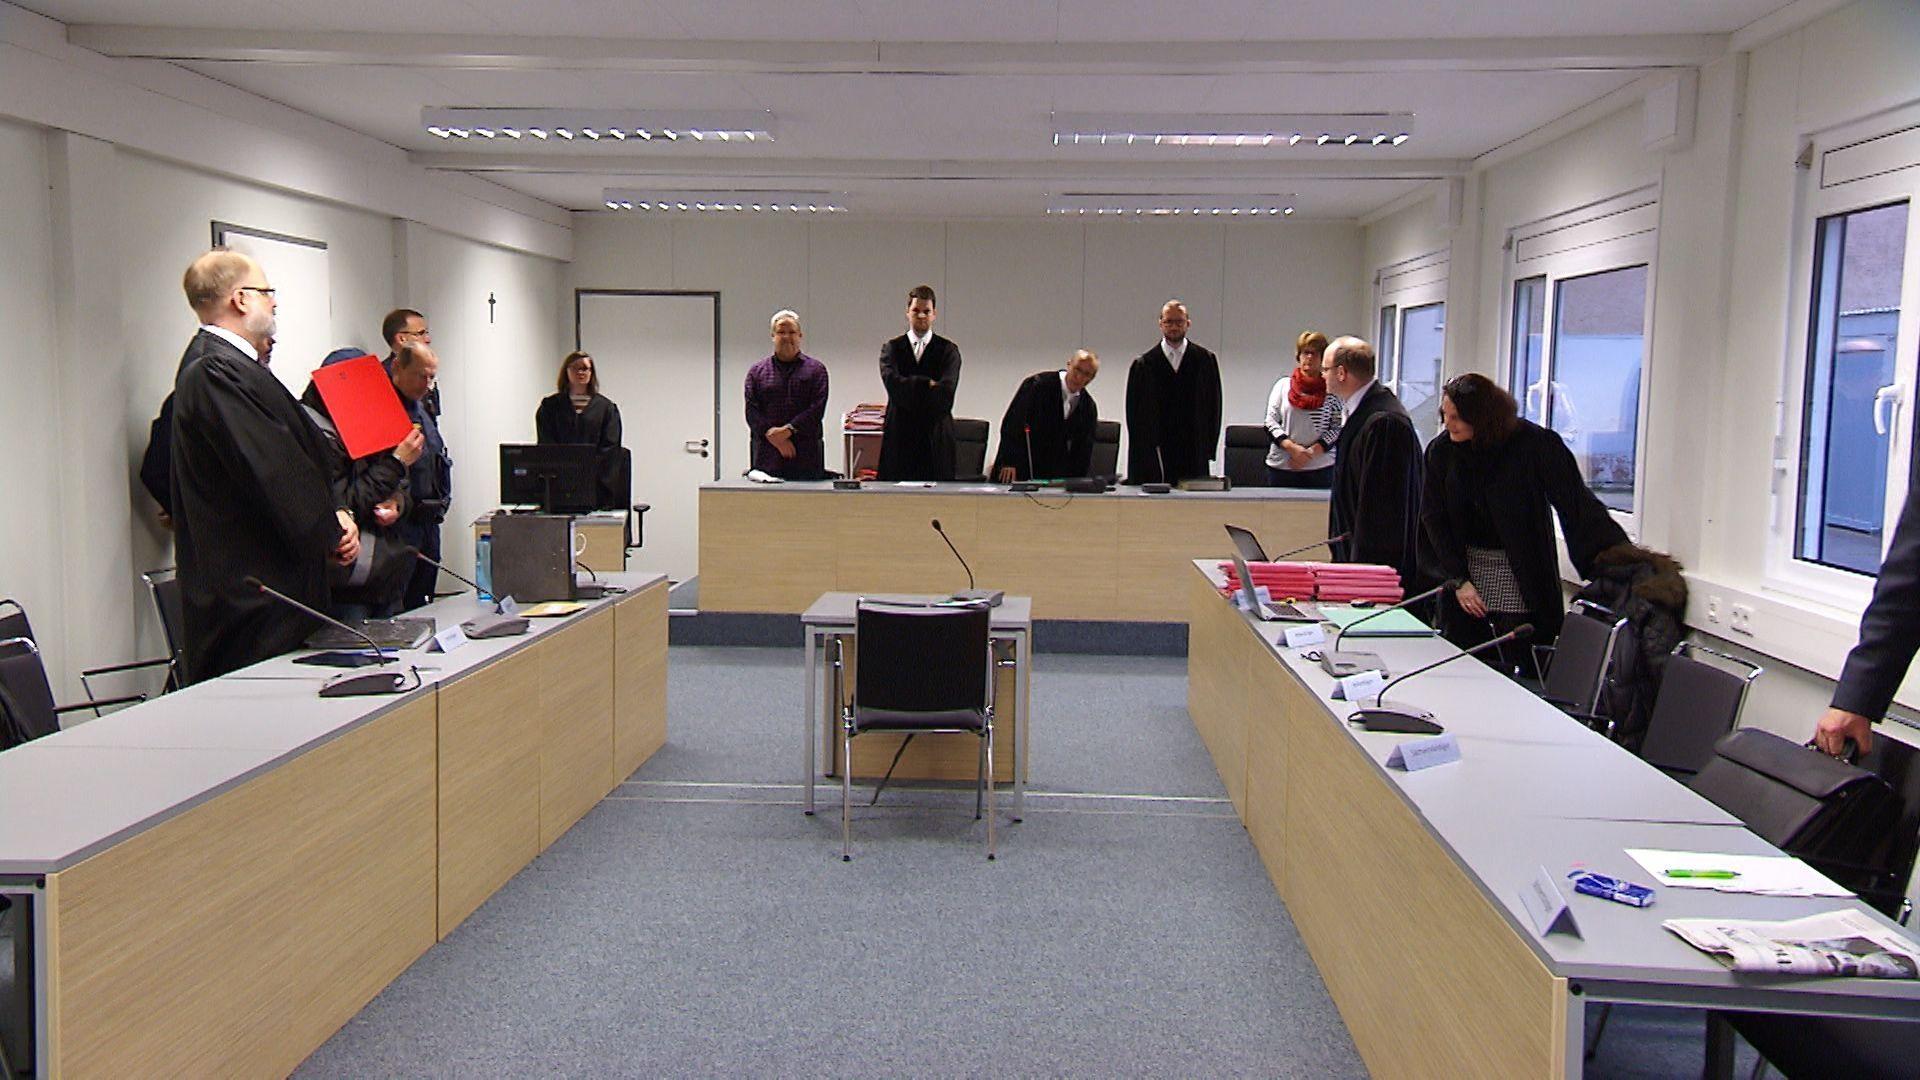 Mordprozess in Aschaffenburg